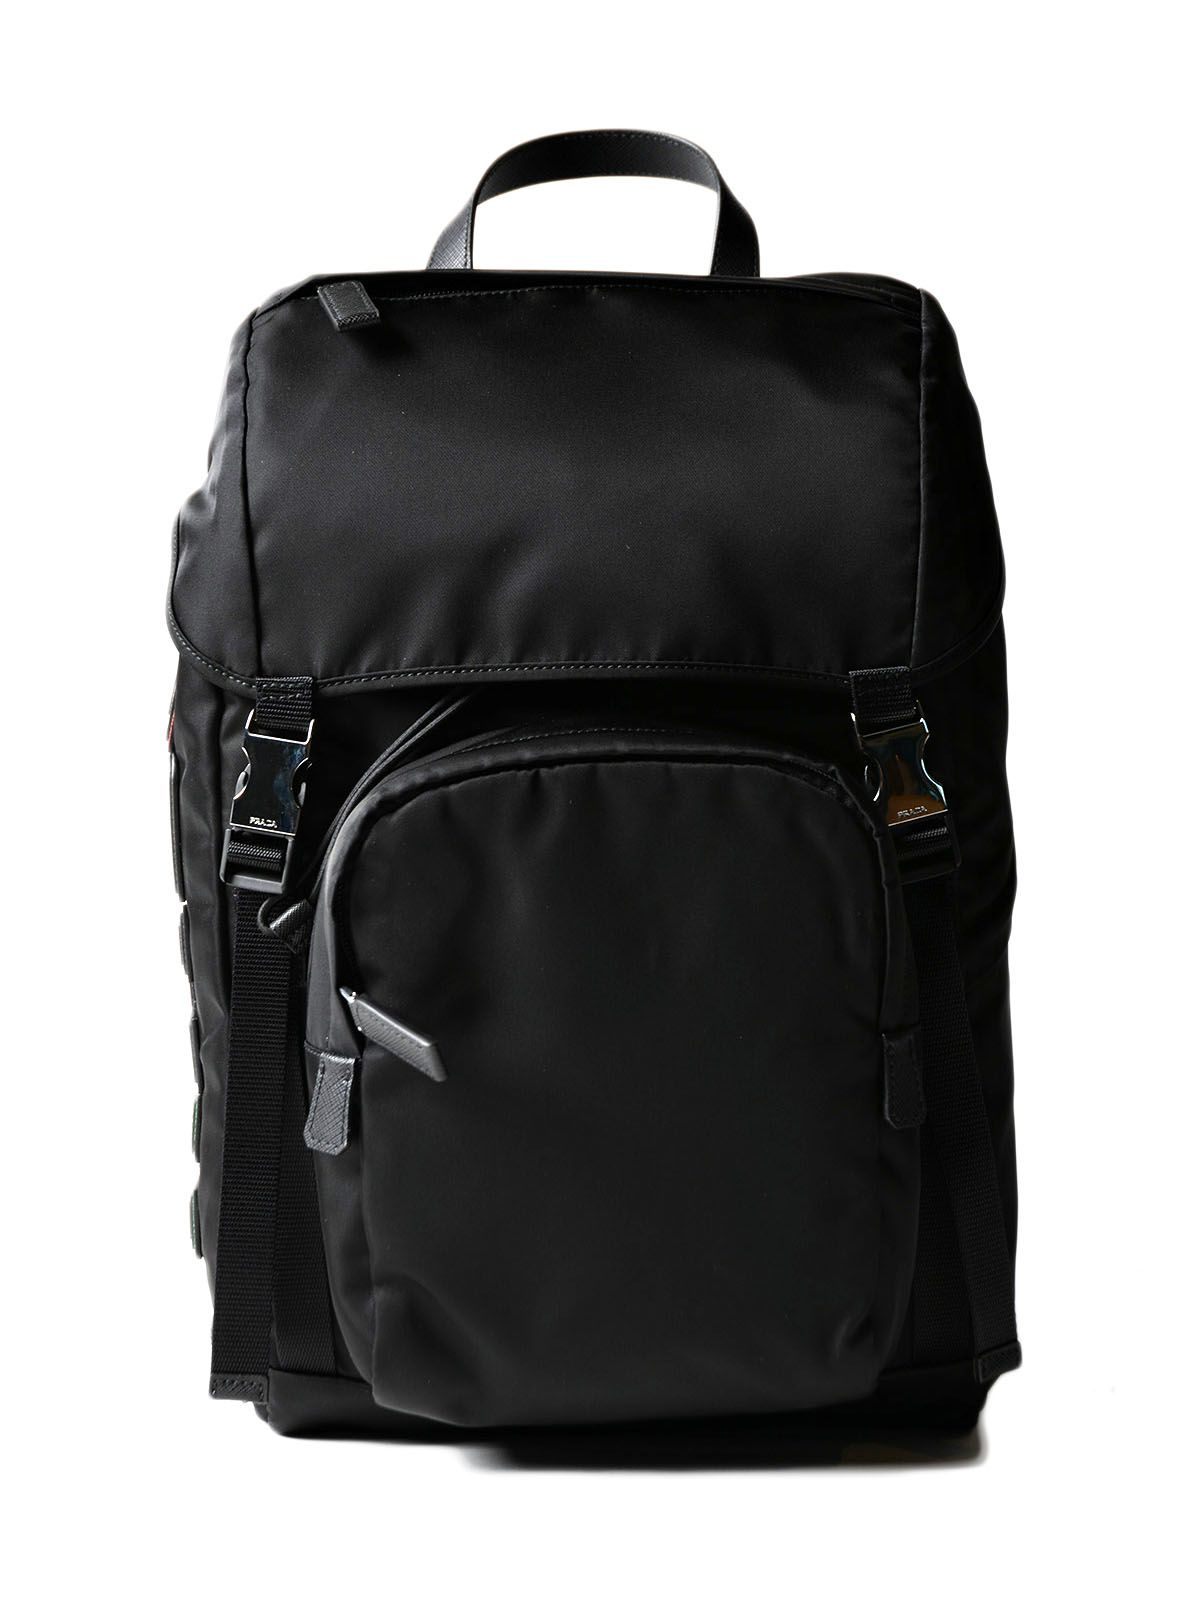 Prada Tessuto Character Backpack